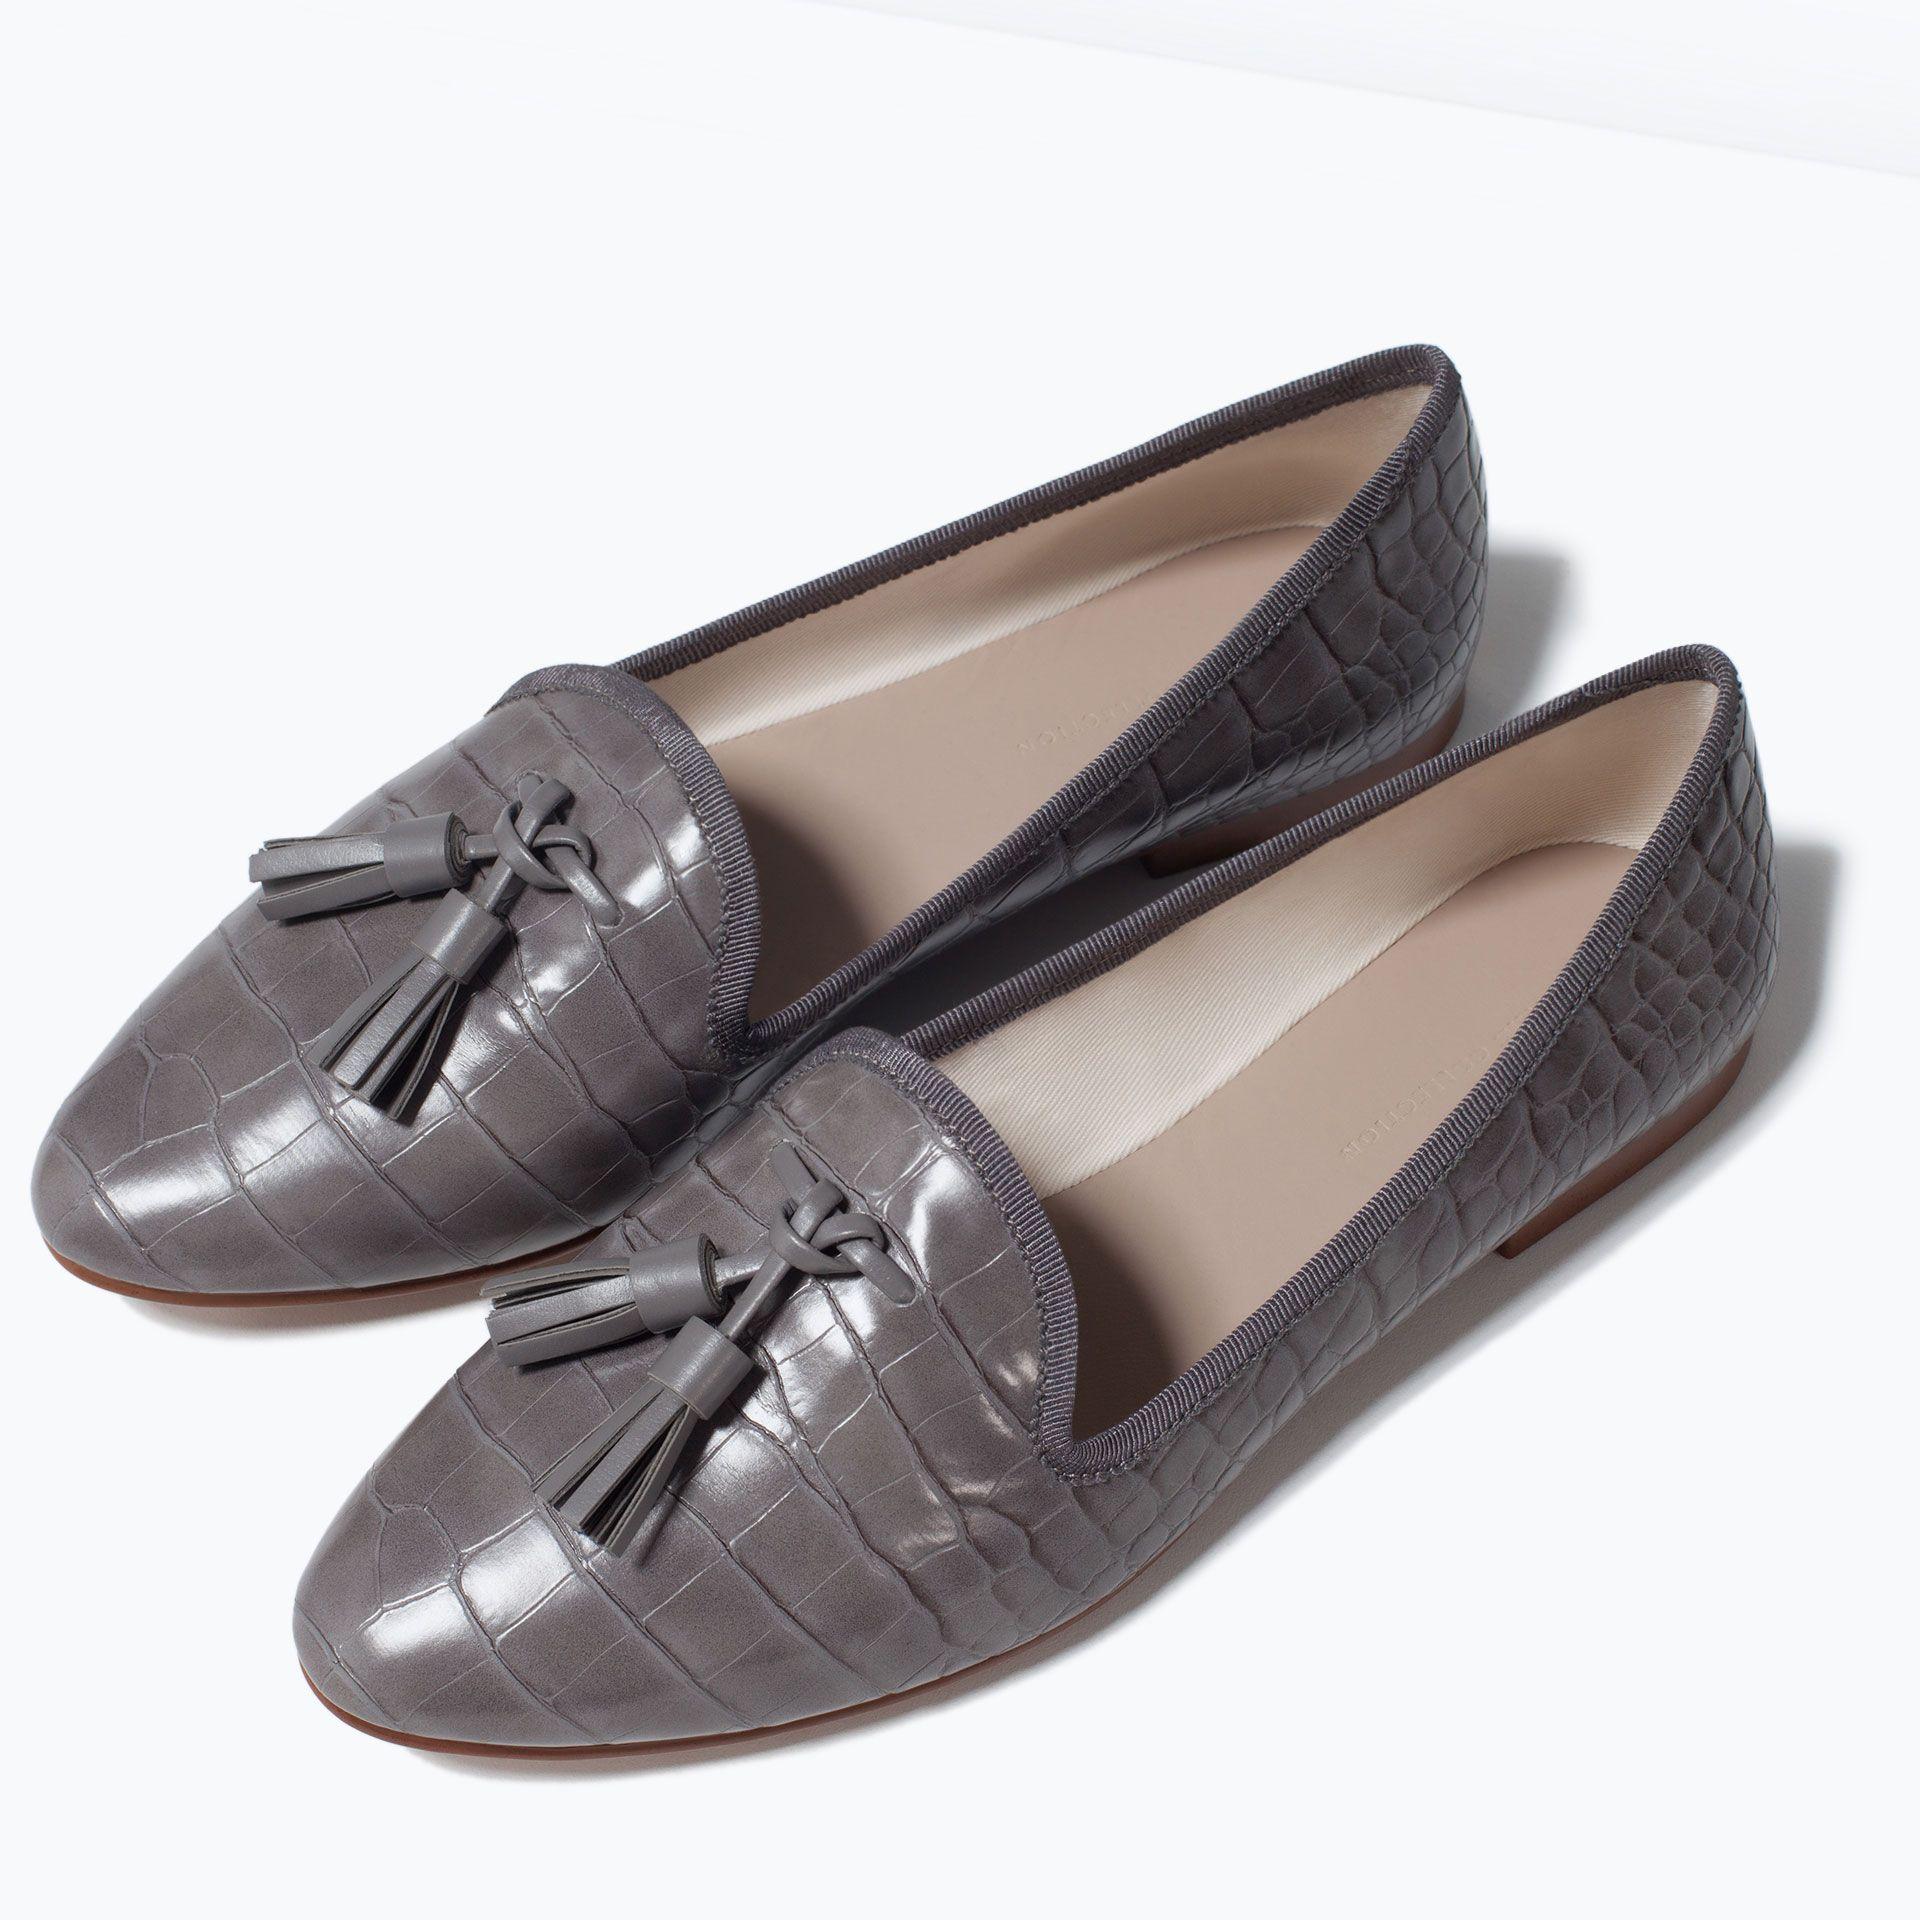 Pantofle Z Fredzlami Buty Kobieta Schuhe Damen Flache Schuhe Damen Frauenschuhe